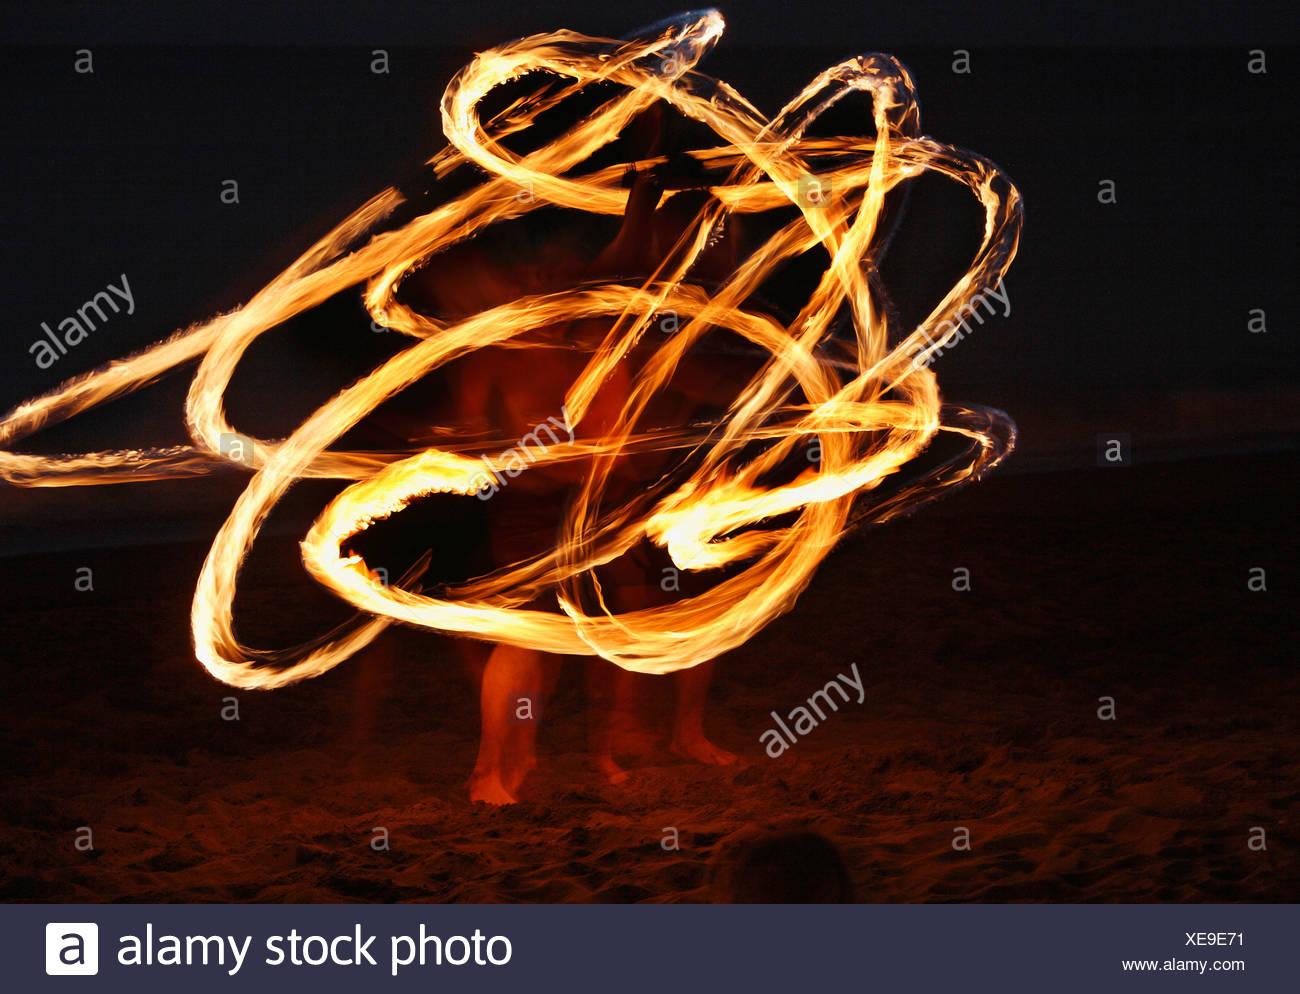 Espagne, Canaries, La Gomera, La Playa, Valle Gran Rey, Personnes faisant la danse de la torche sur la plage au soir Photo Stock